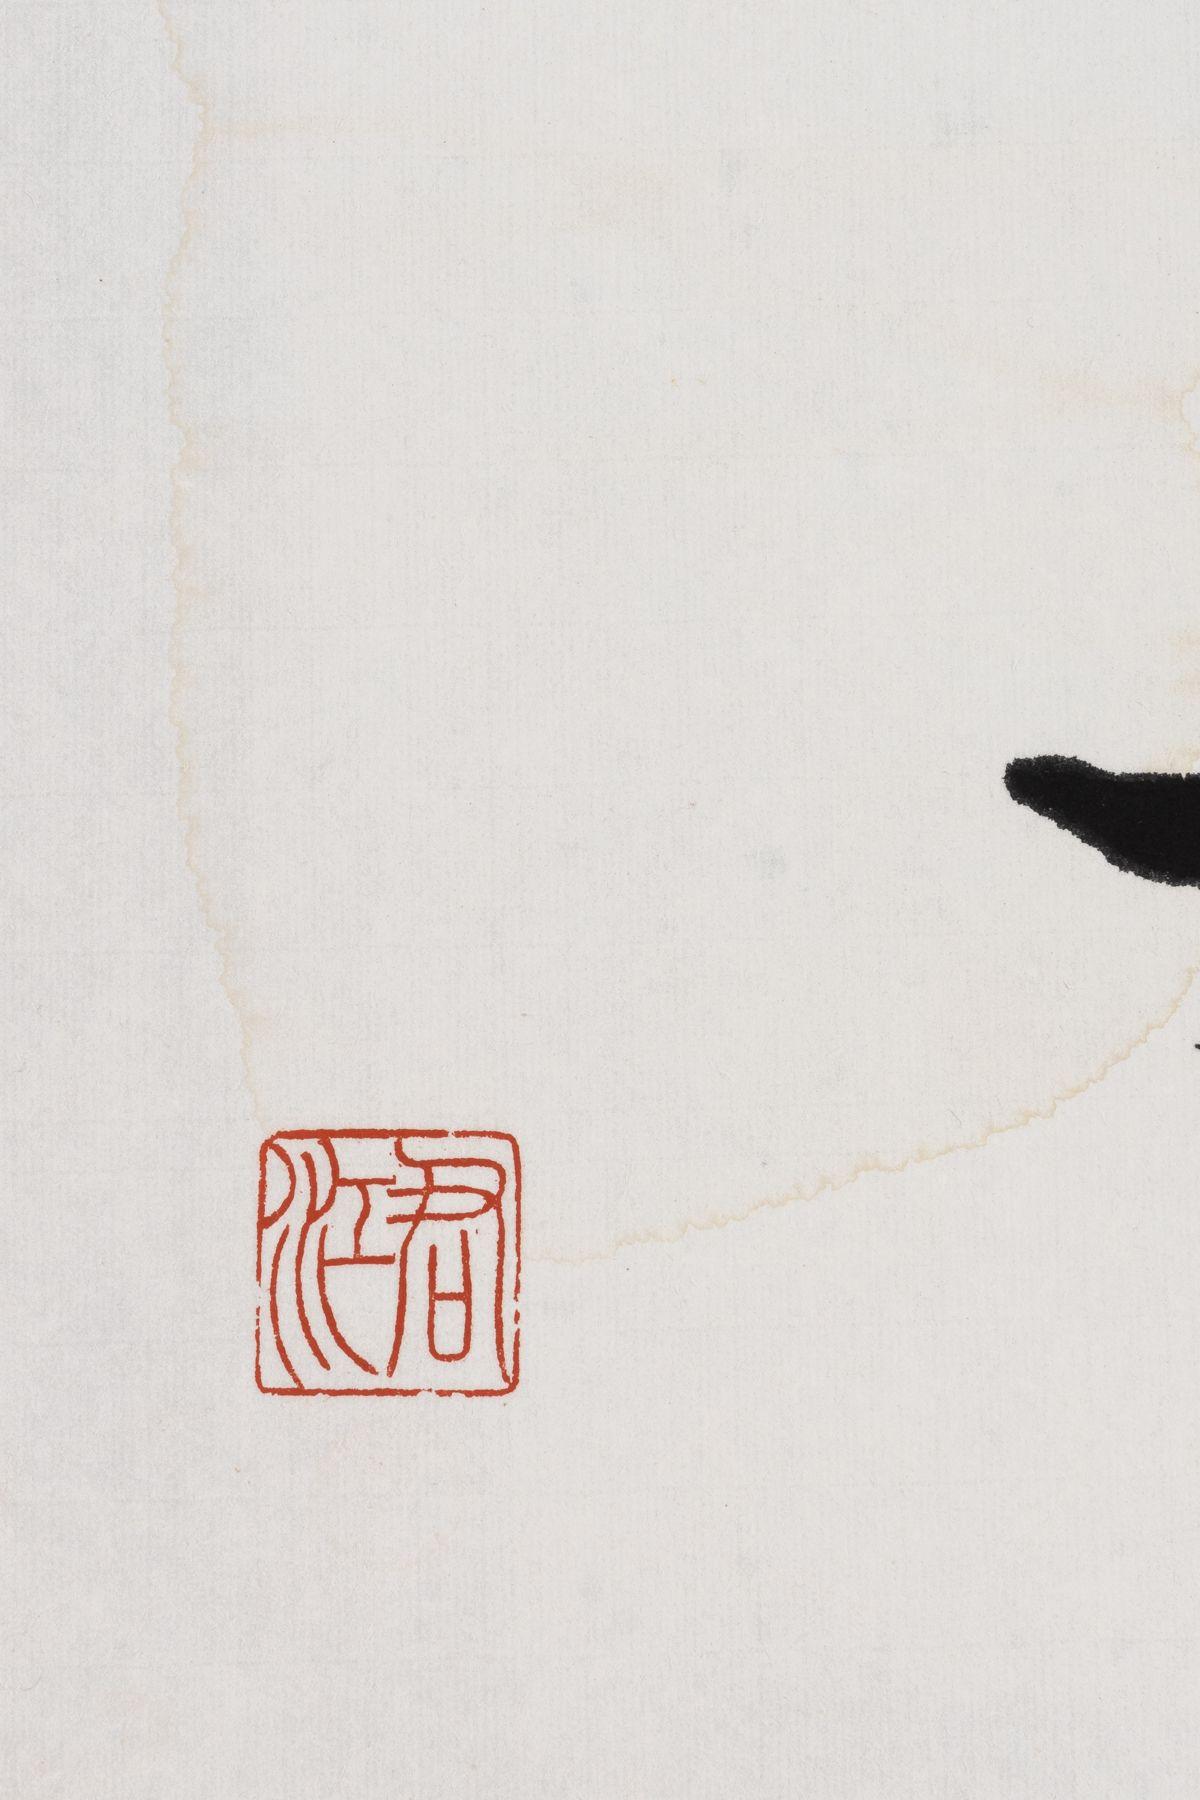 Setsugetsuka (Snow, Moon, Flowers)